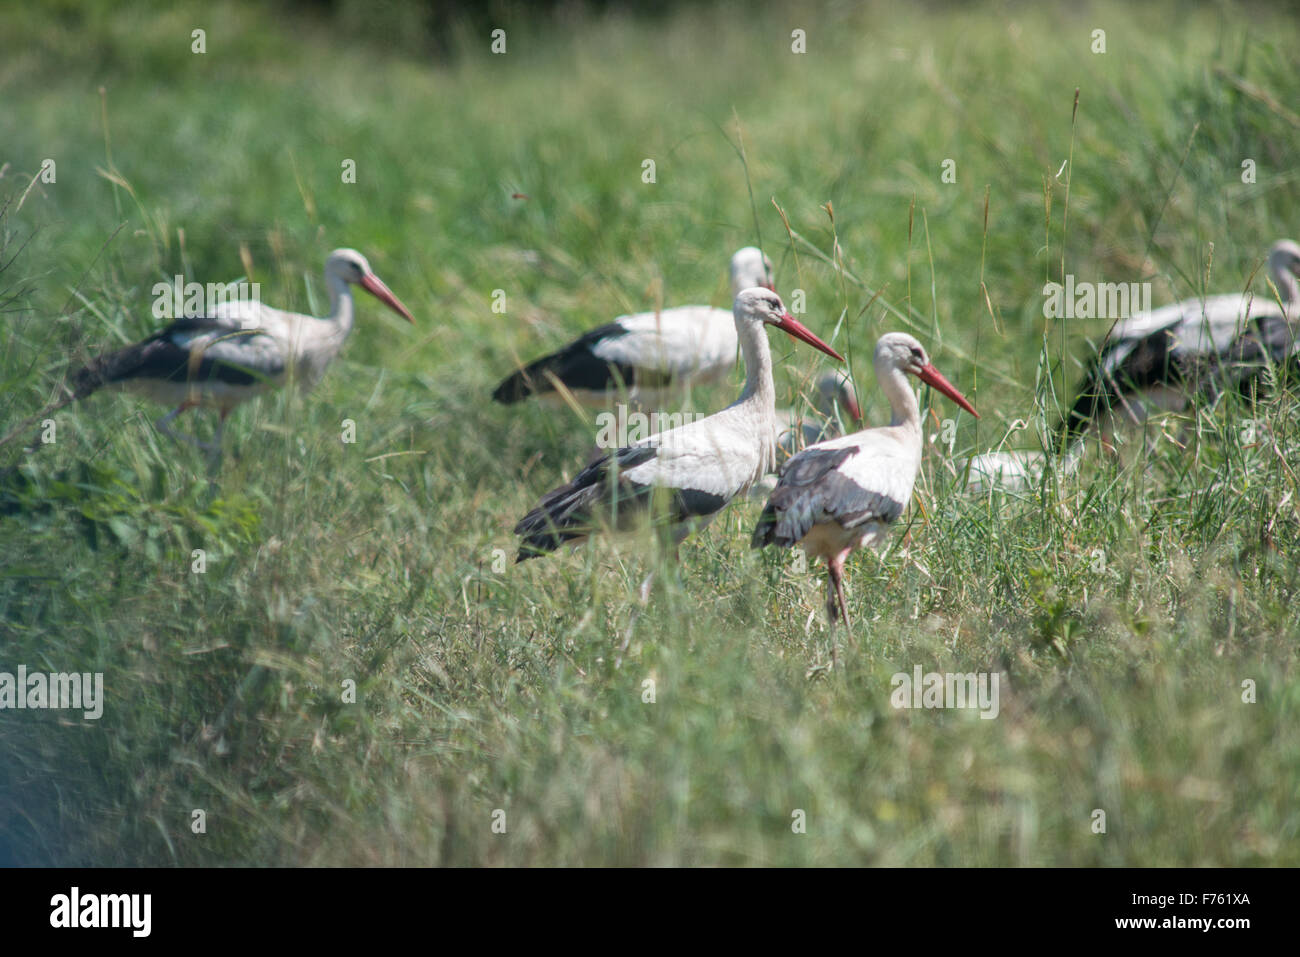 SOUTH AFRICA- Kruger National Park Stork (Ciconiidae) - Stock Image